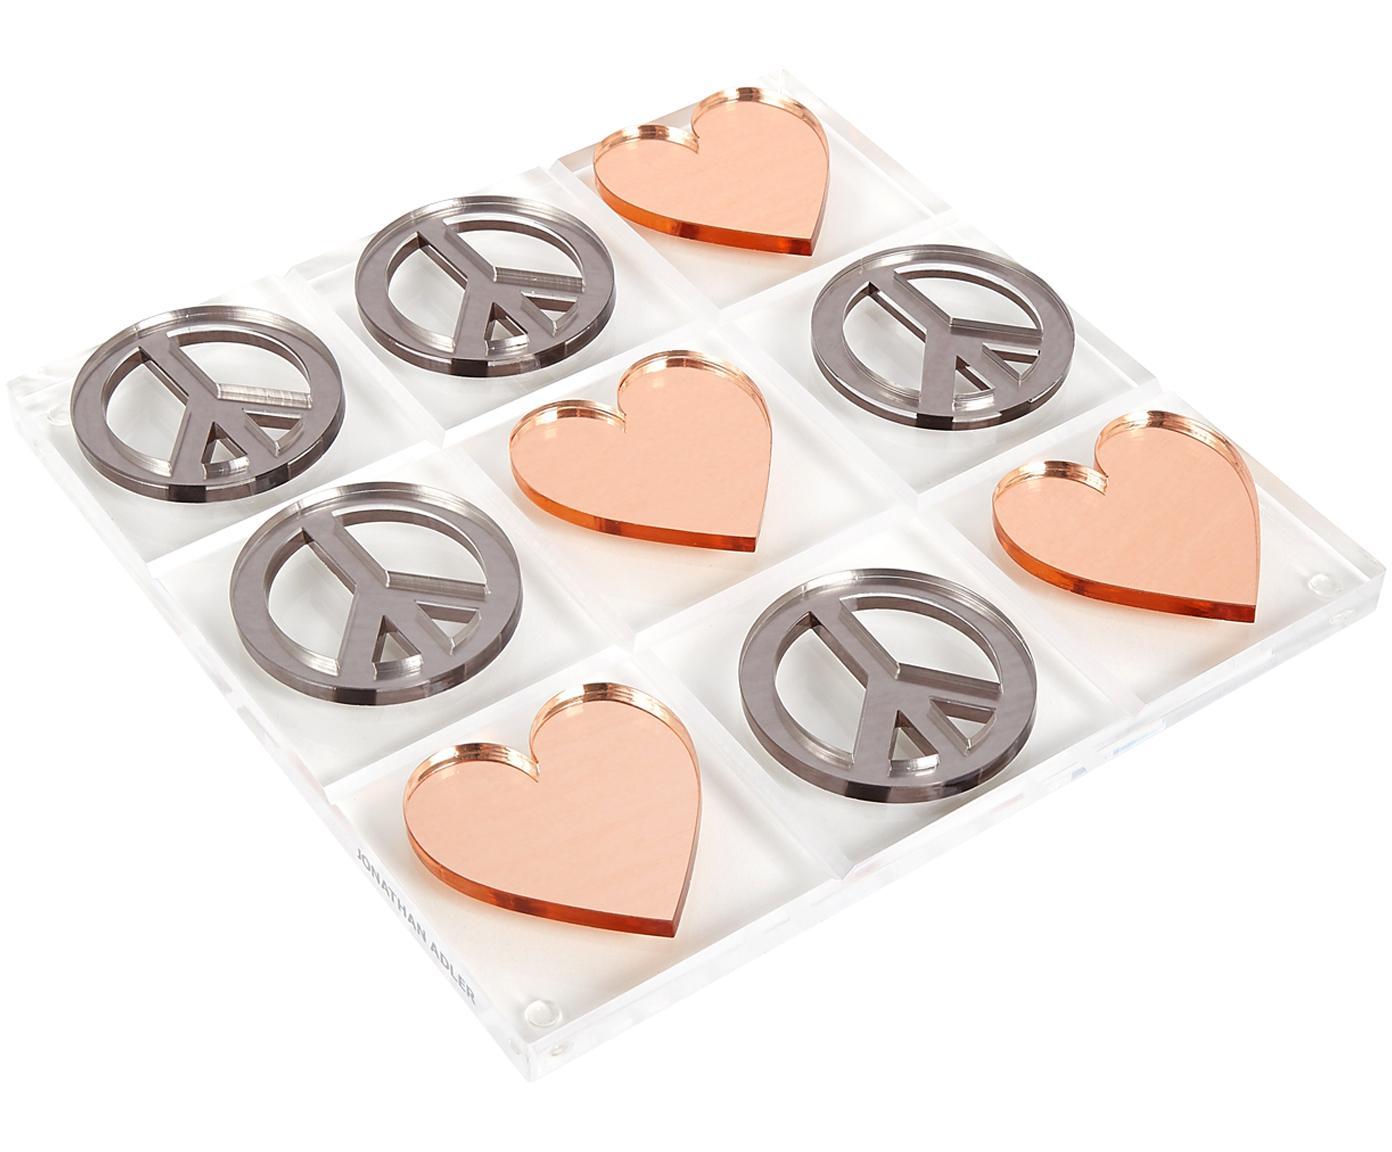 Bordspel Love & Peace Tic Tac Toe, 100% acrylglas, Speelstenen: zilverkleurig, koperkleurig. Speelbord: transparant, 26 x 26 cm